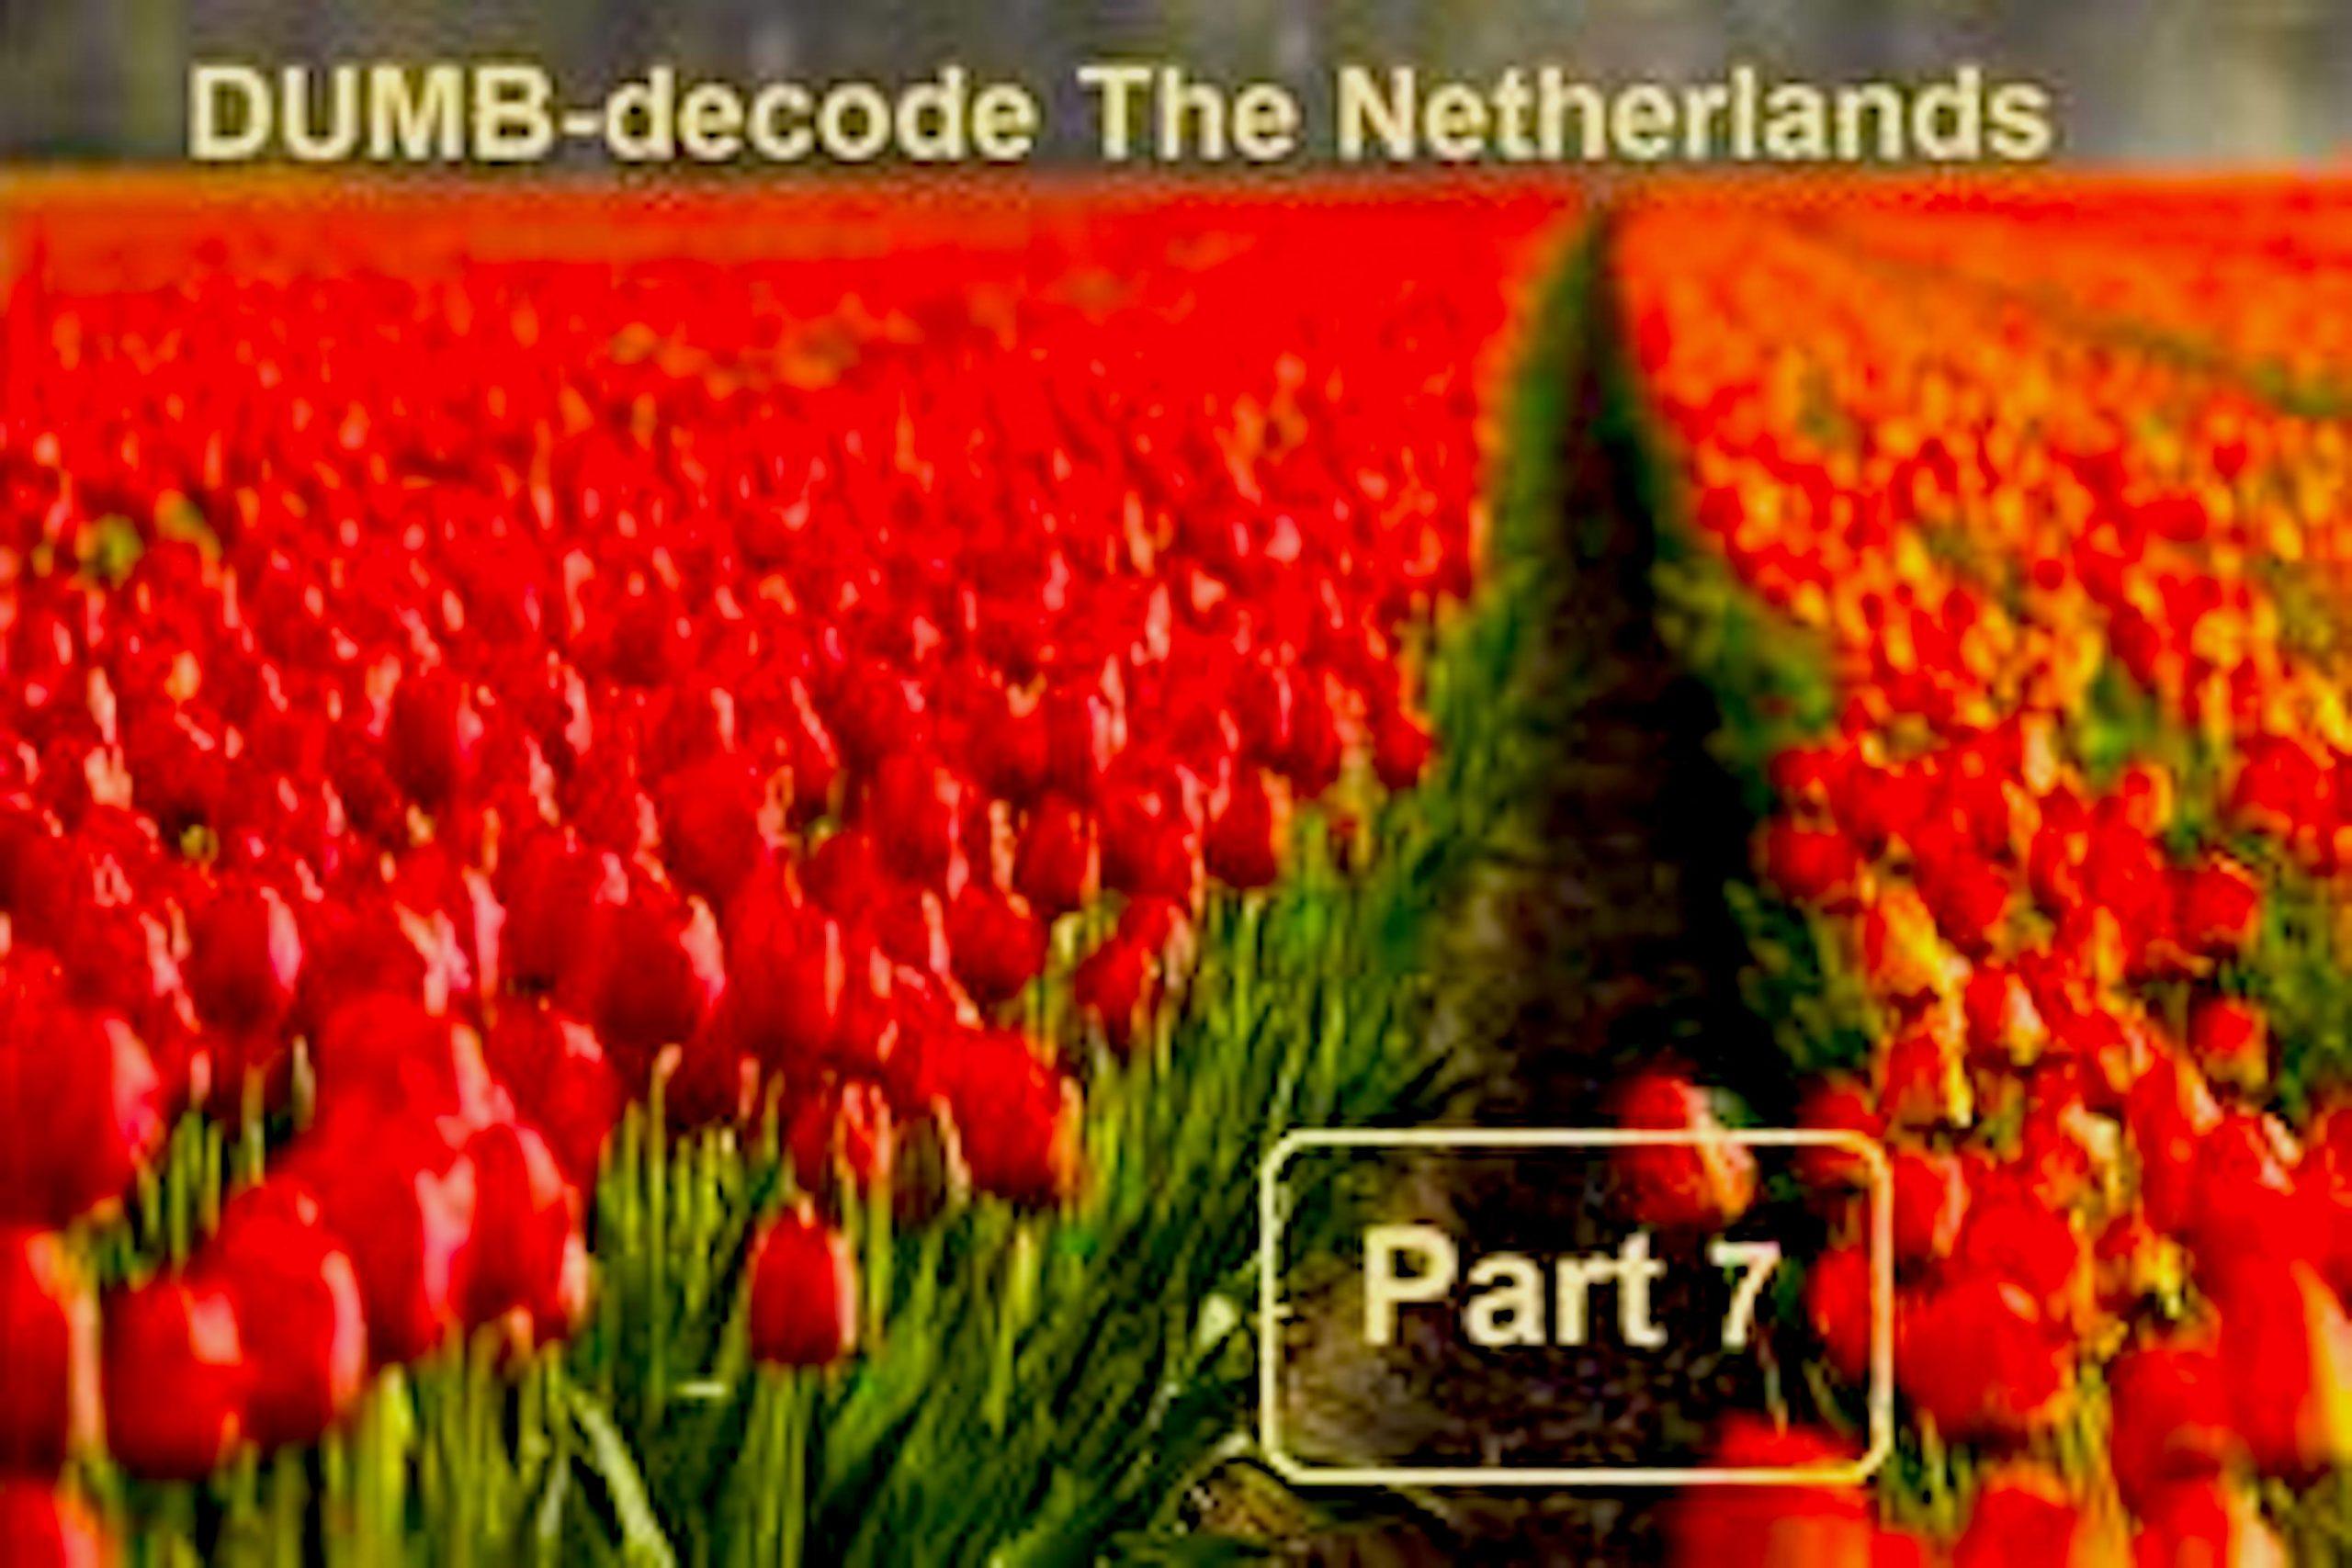 Gene Decode! The Netherlands Underground Bases (7) Update (foto BitChute)